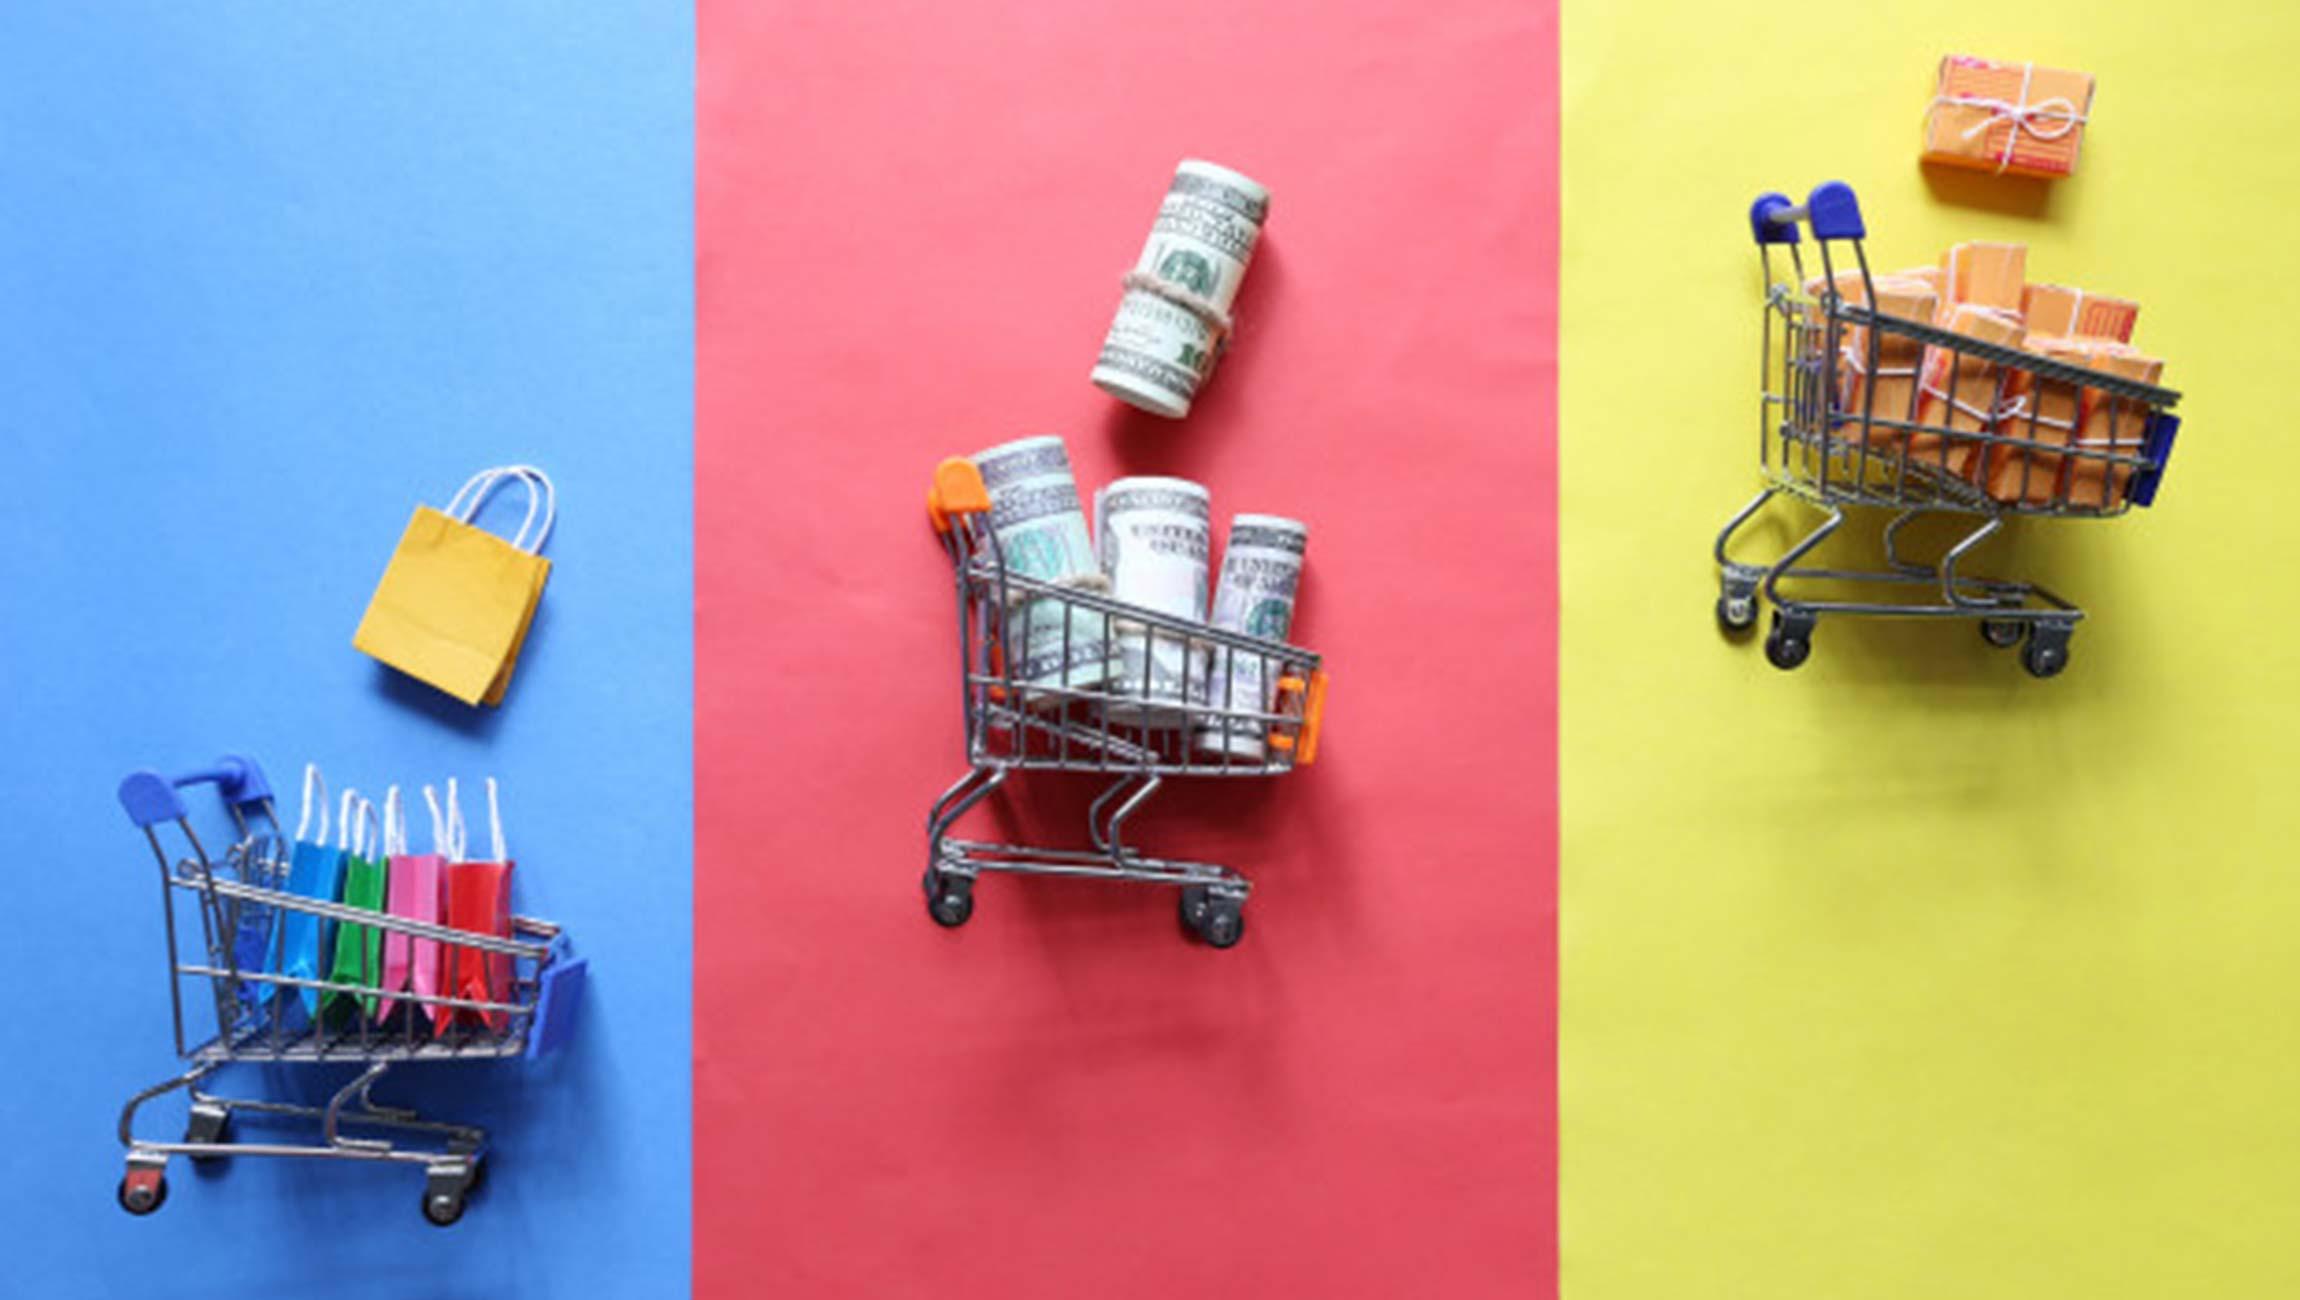 Top eCommerce Tactics to Reduce Cart Abandonment, According to eCommerce Development Rating Platform